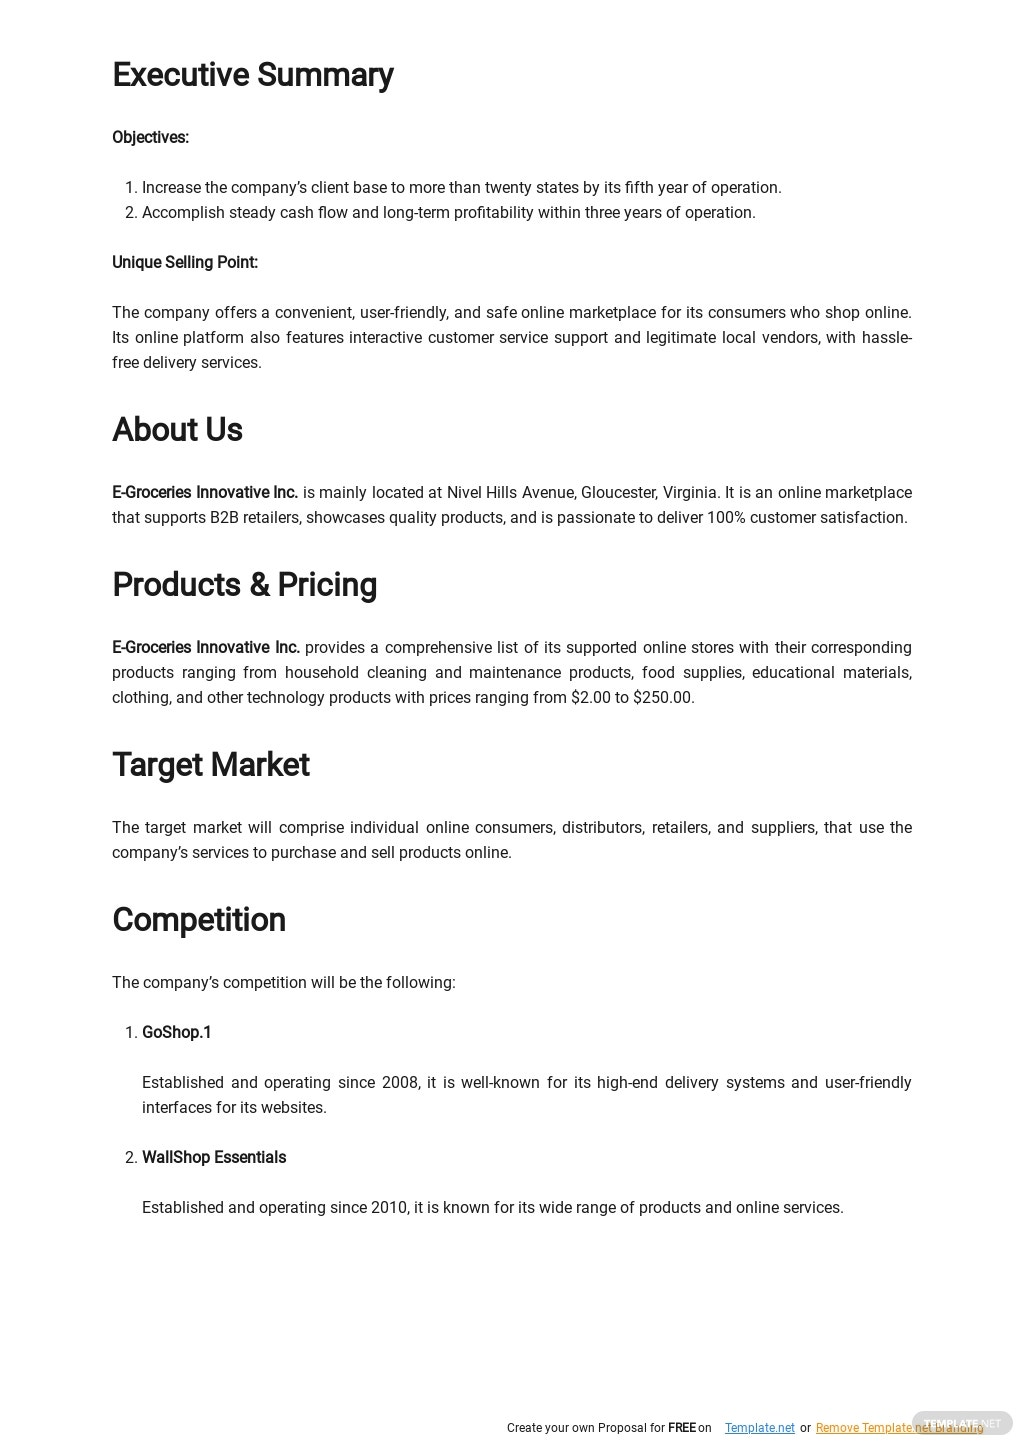 Online Marketplace Business Plan Template 1.jpe